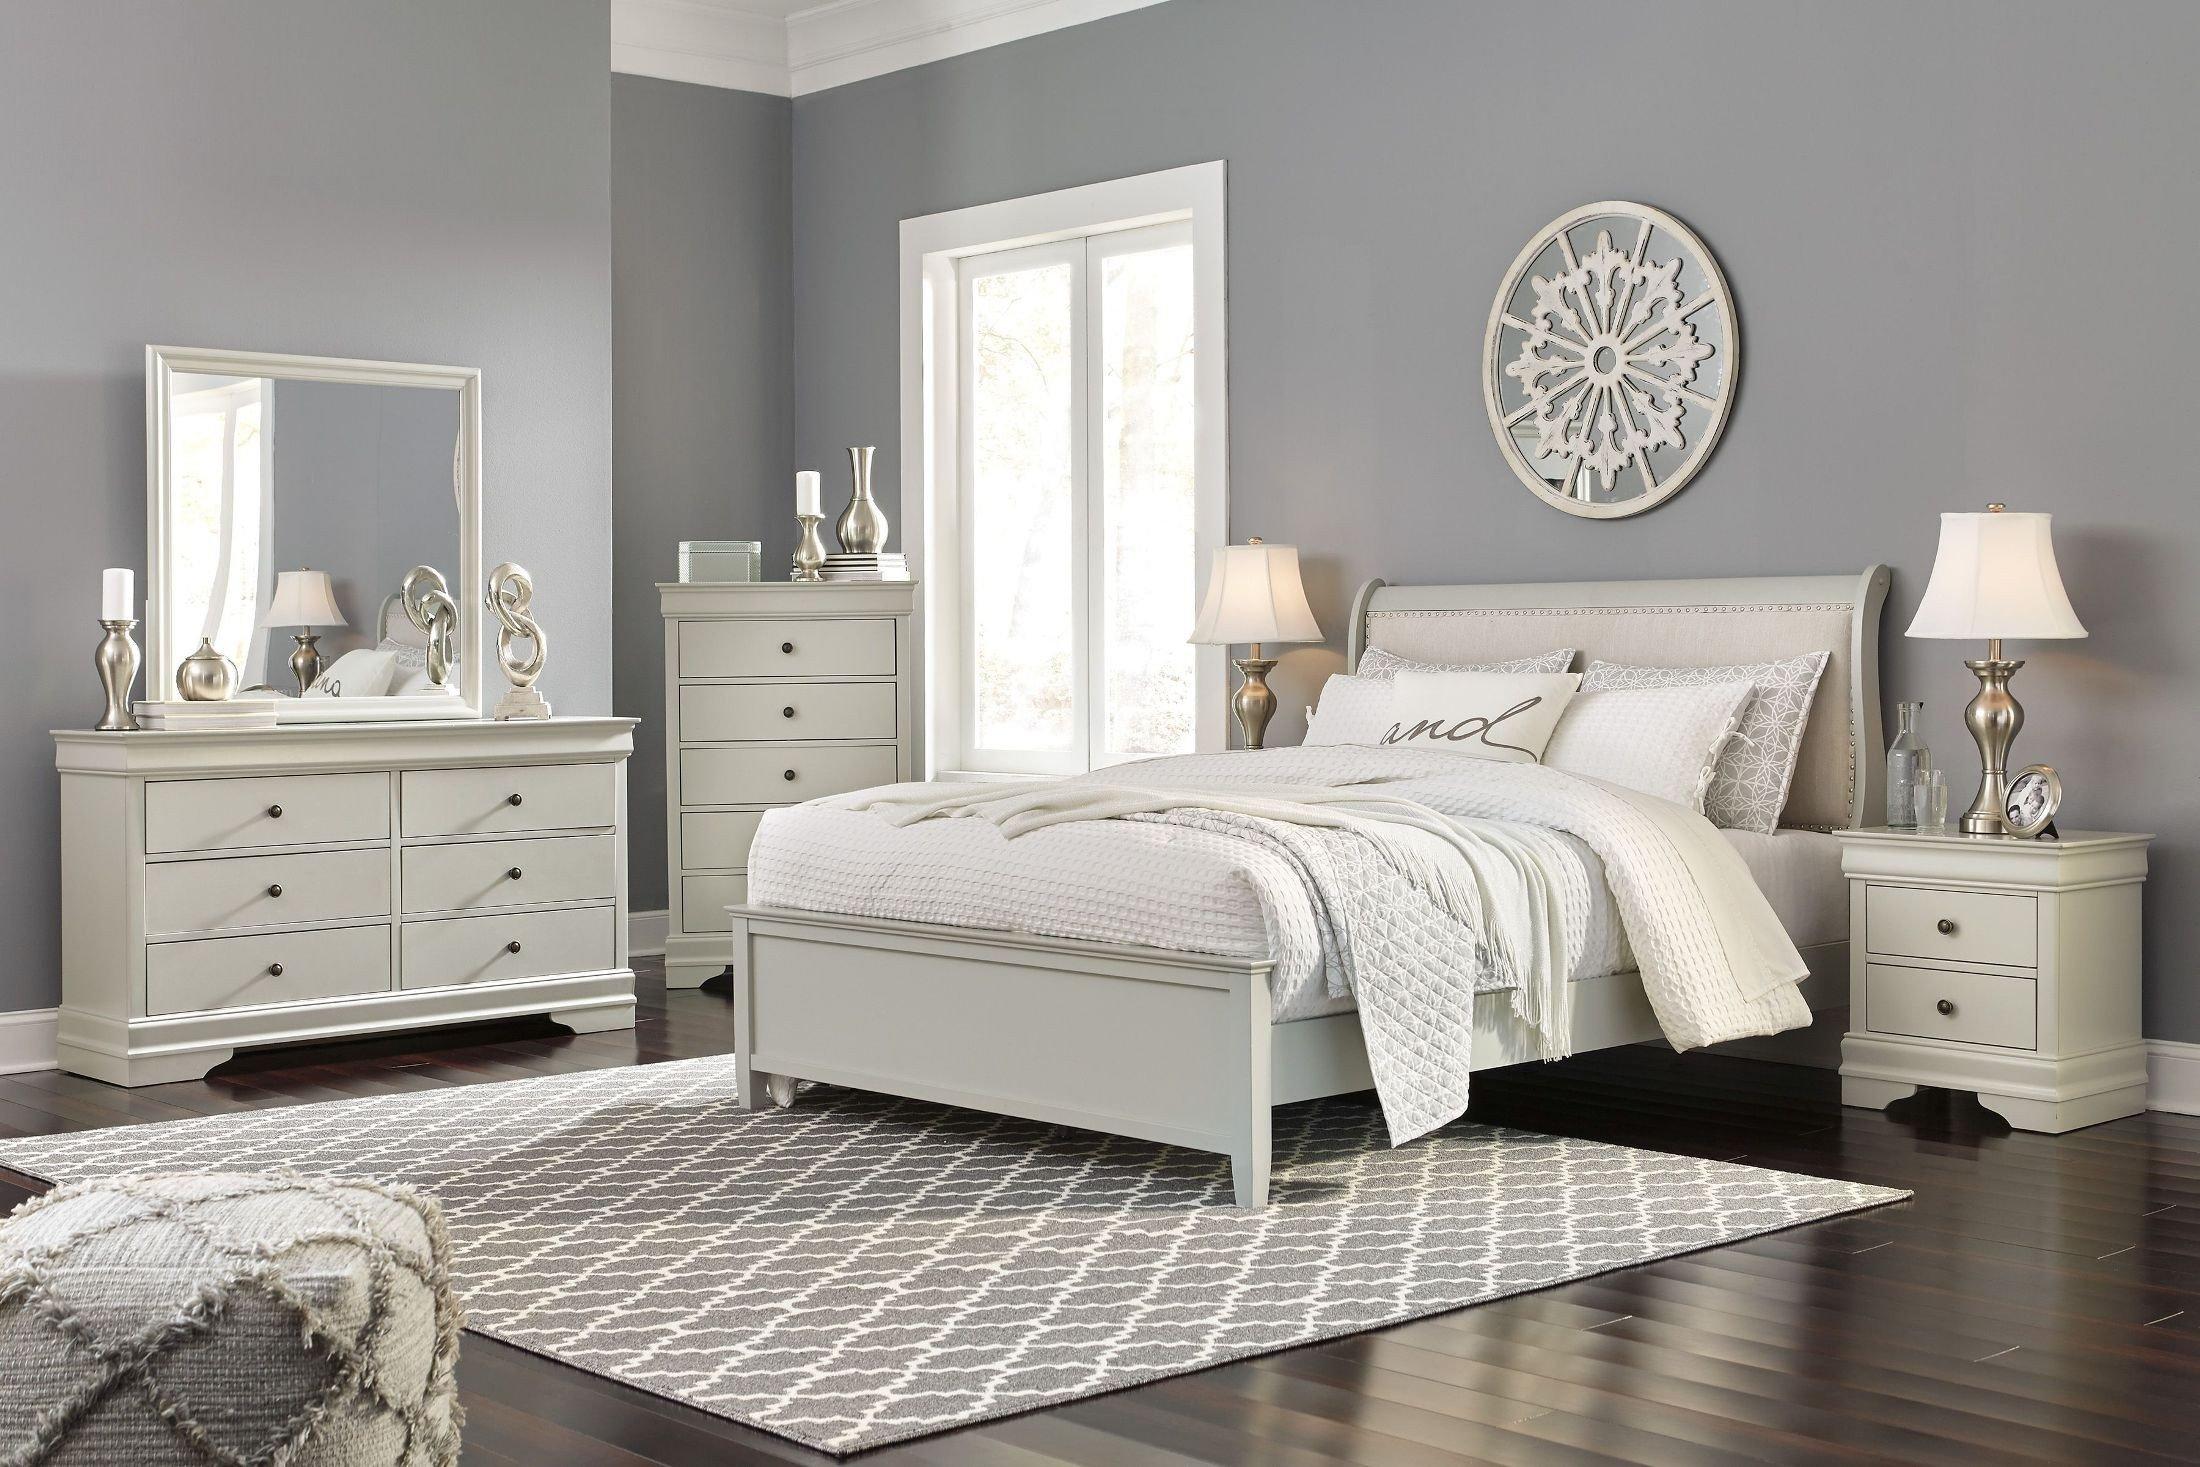 Ashley Furniture Bedroom Set Price Elegant Emma Mason Signature Jarred 5 Piece Sleigh Bedroom Set In Gray